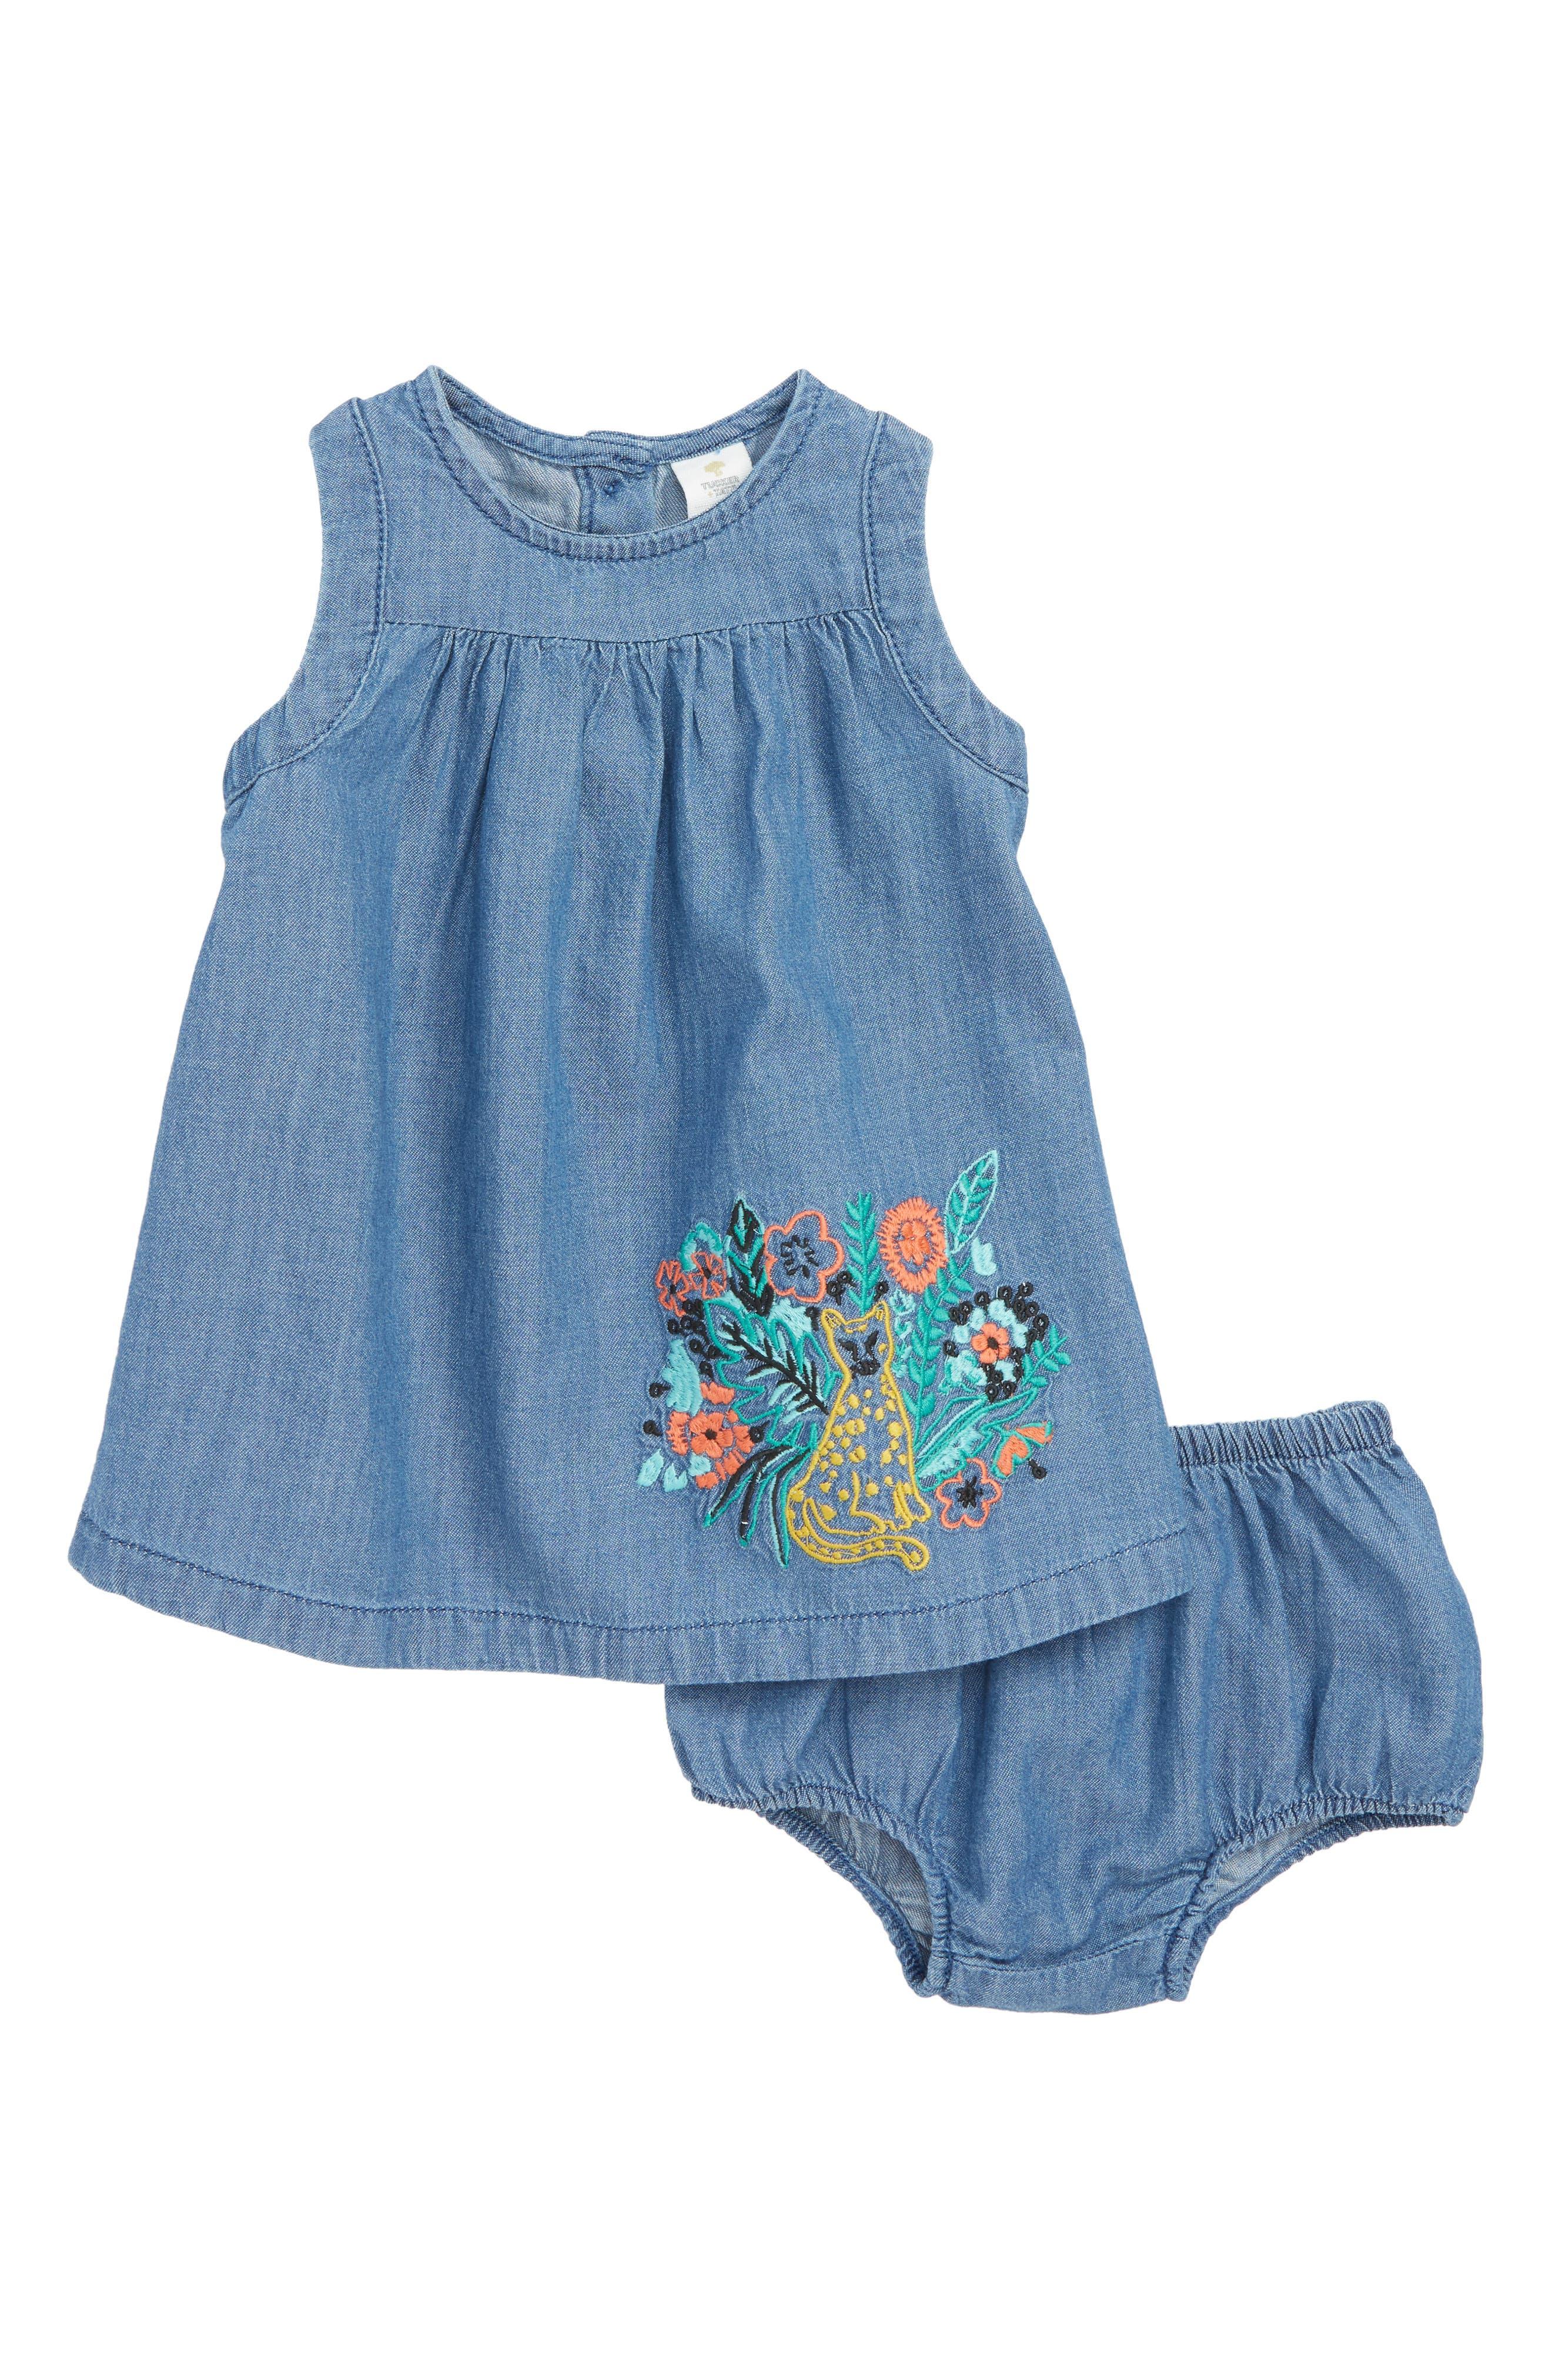 Embroidered Chambray Dress,                             Main thumbnail 1, color,                             Blue Wash Jungle Cat